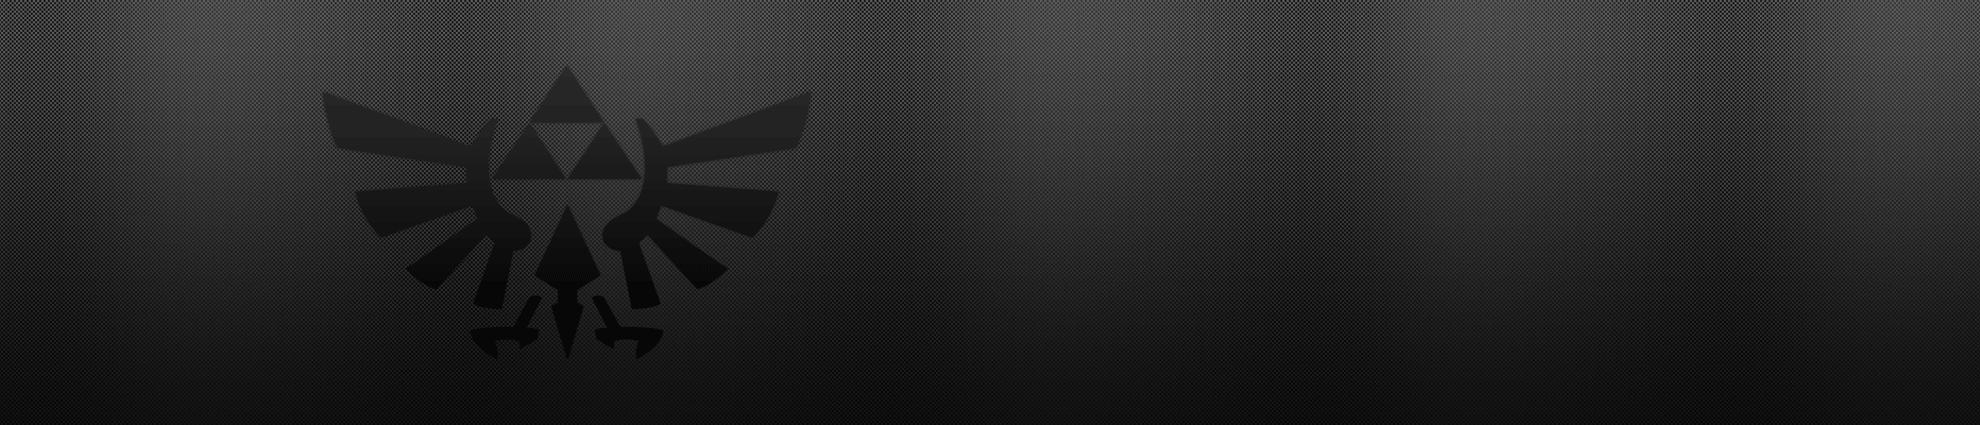 Website-Header-Zelda-TriforceDark-LeftSide